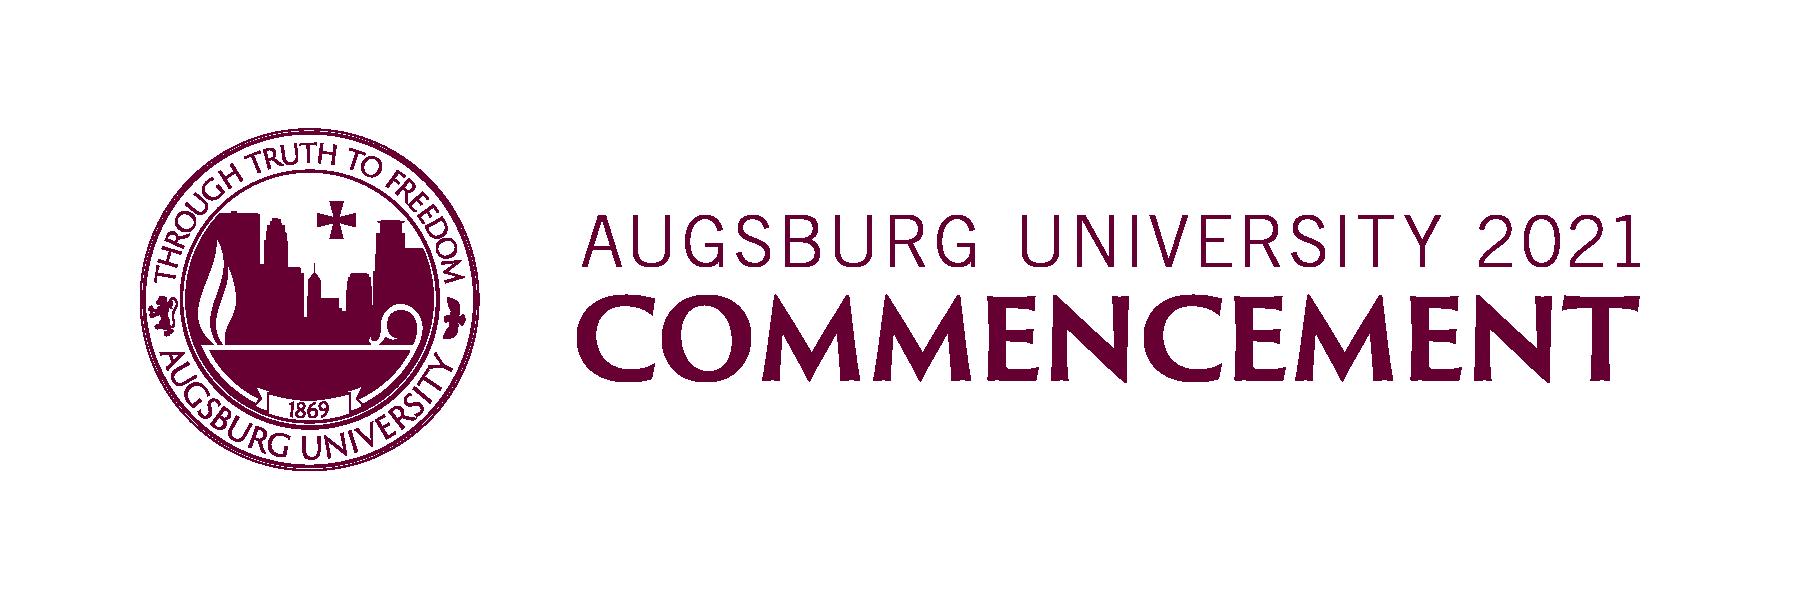 Augsburg University 2021 Commencement